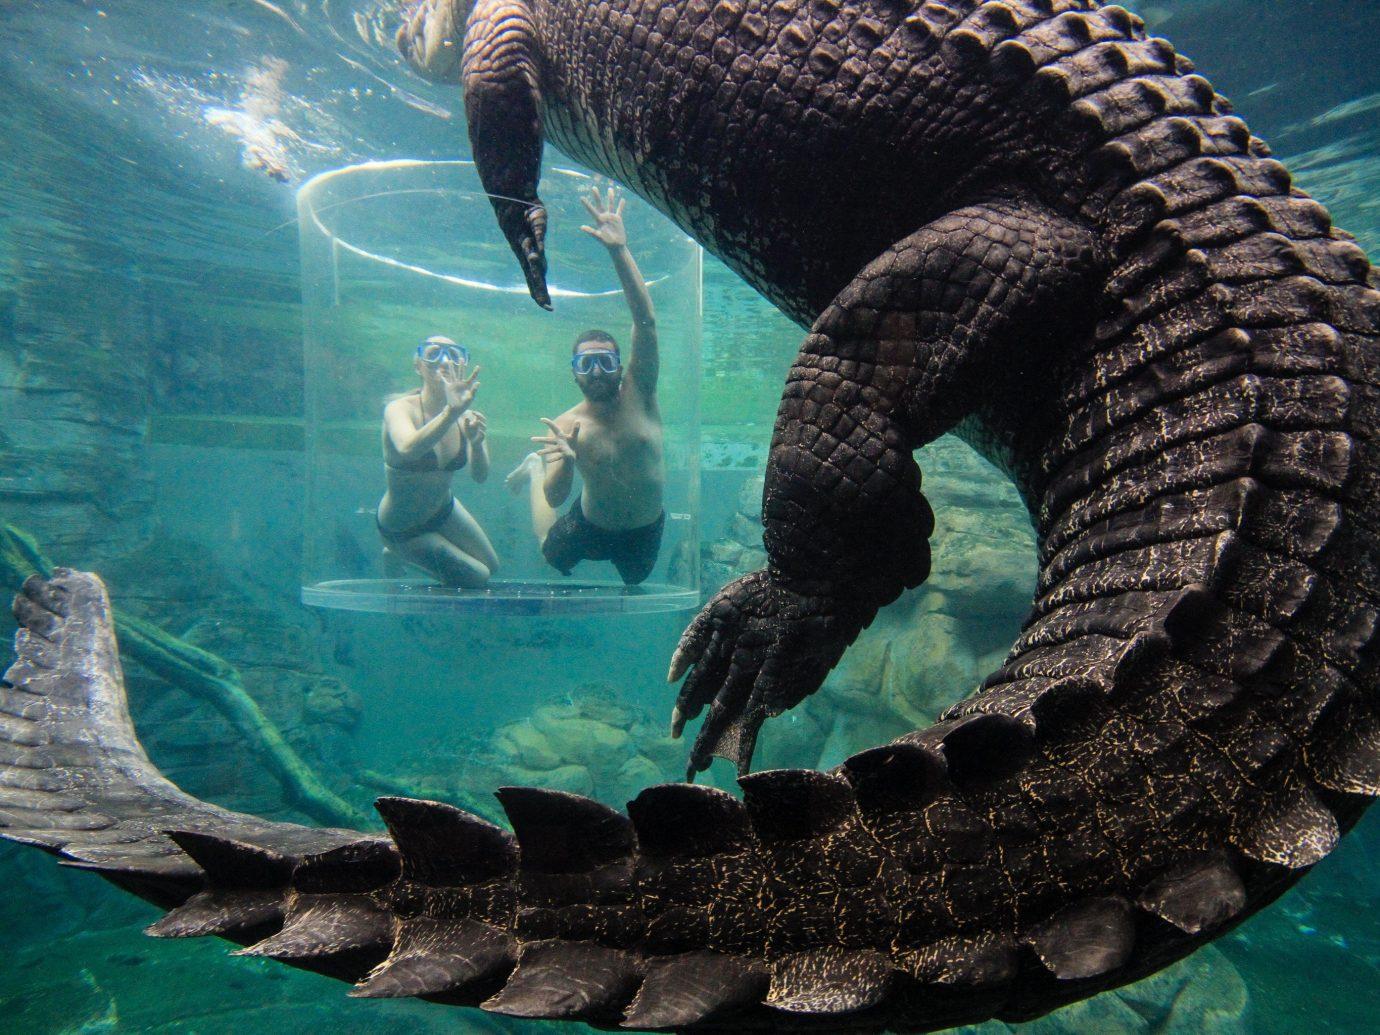 Trip Ideas water reptile animal marine biology fauna organism underwater swimming Wildlife marine mammal